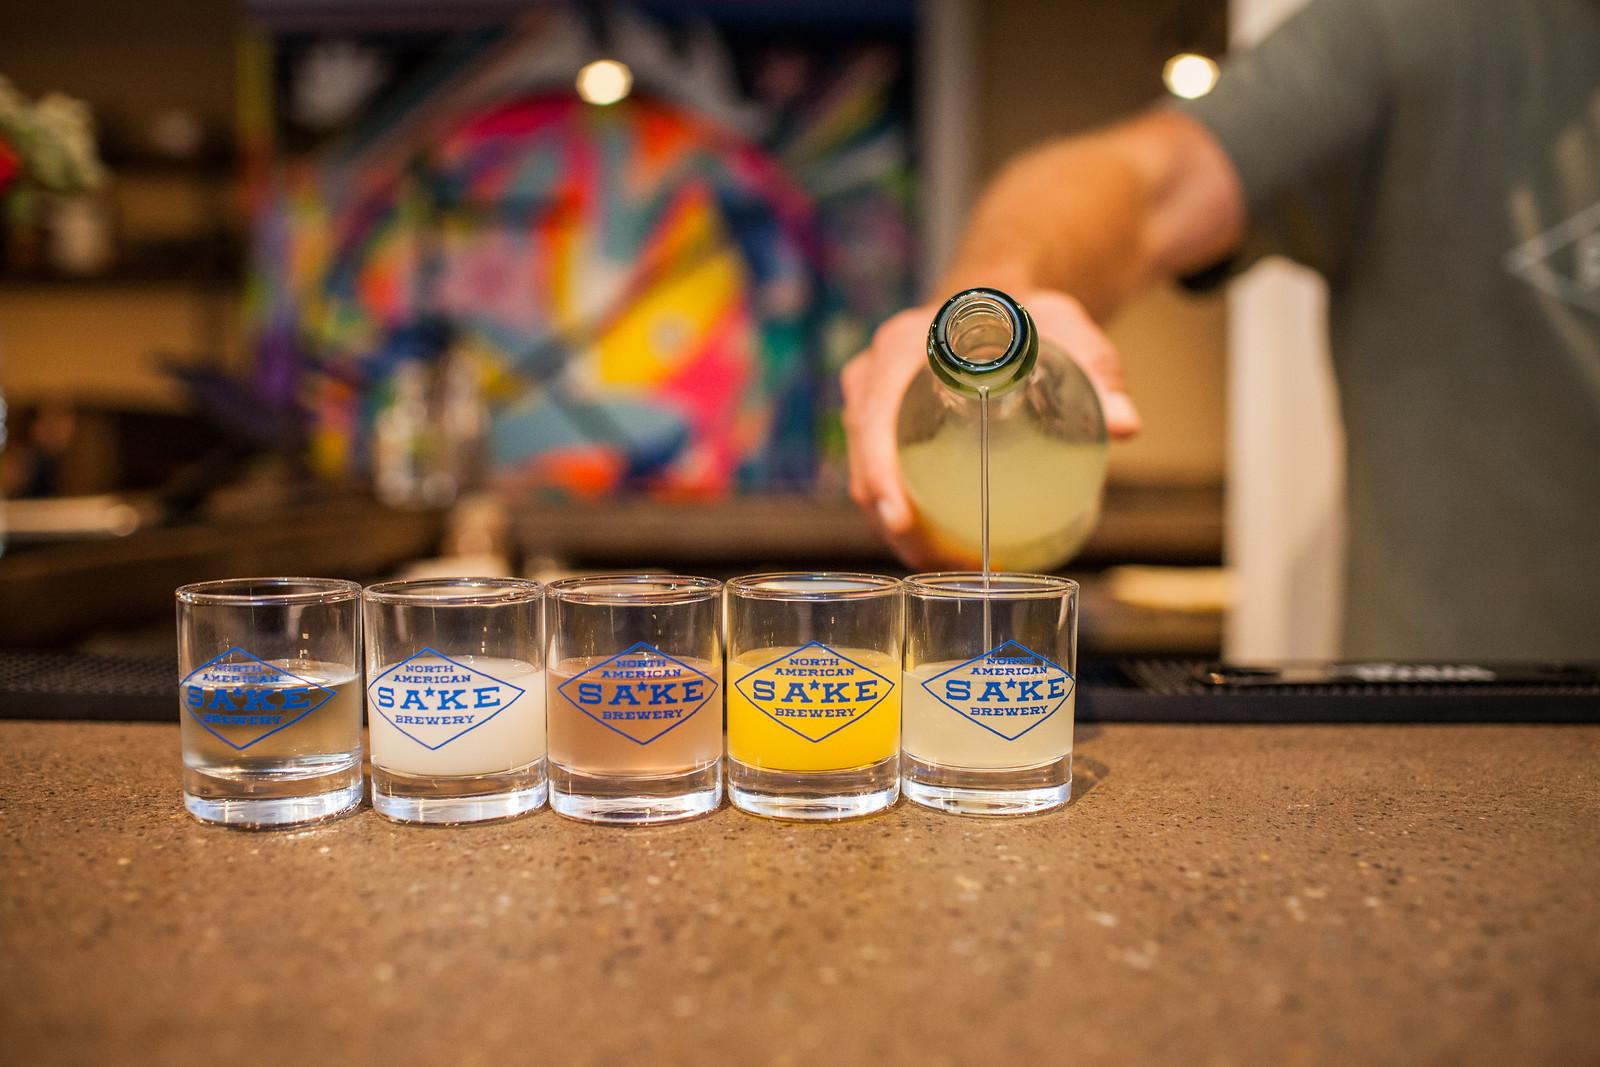 North American Sake Brewery, craft brewery Charlottesville